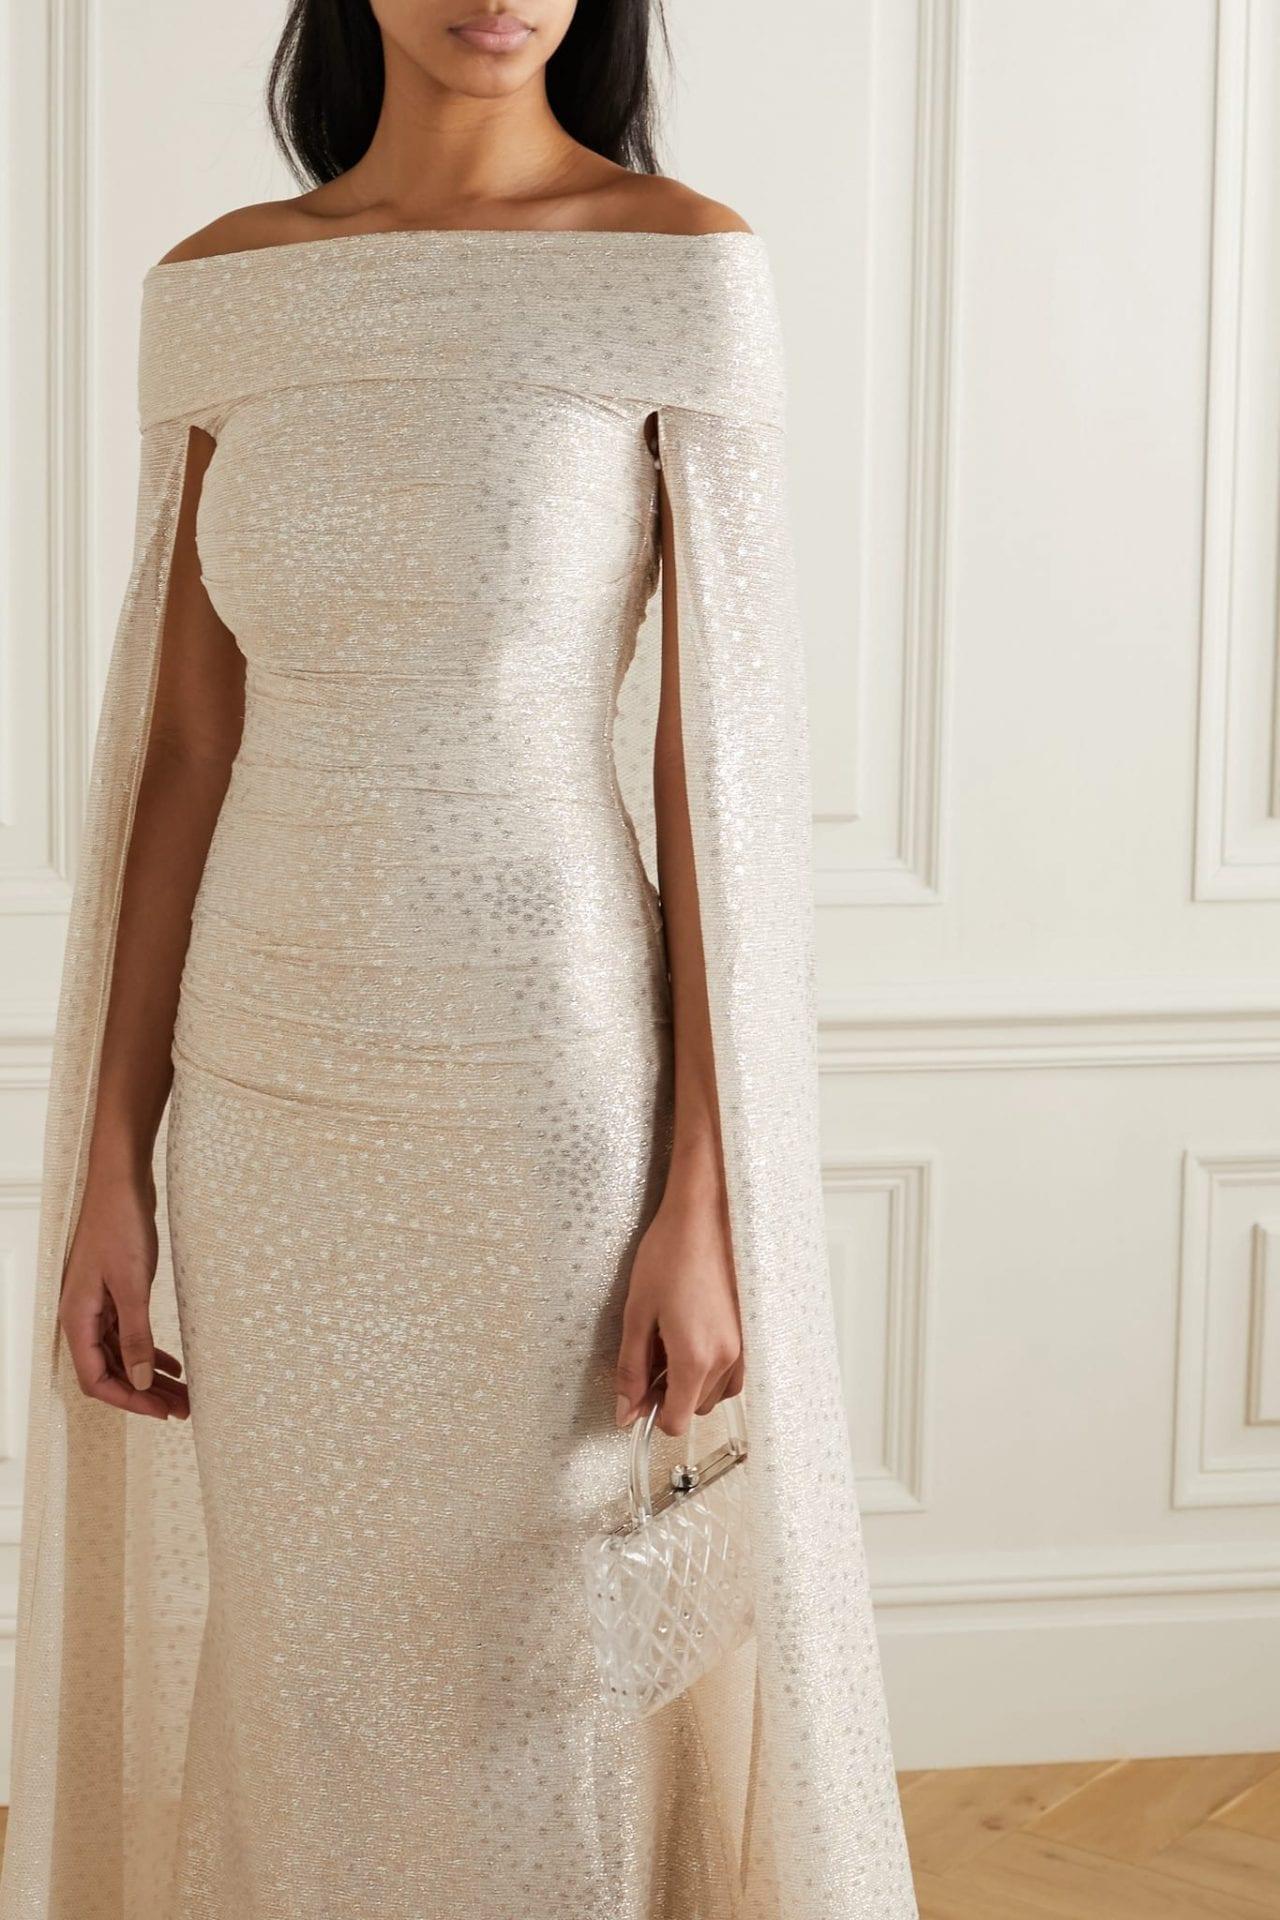 TALBOT RUNHOF Bortolo Cape-effect Ruched Metallic Voile Gown